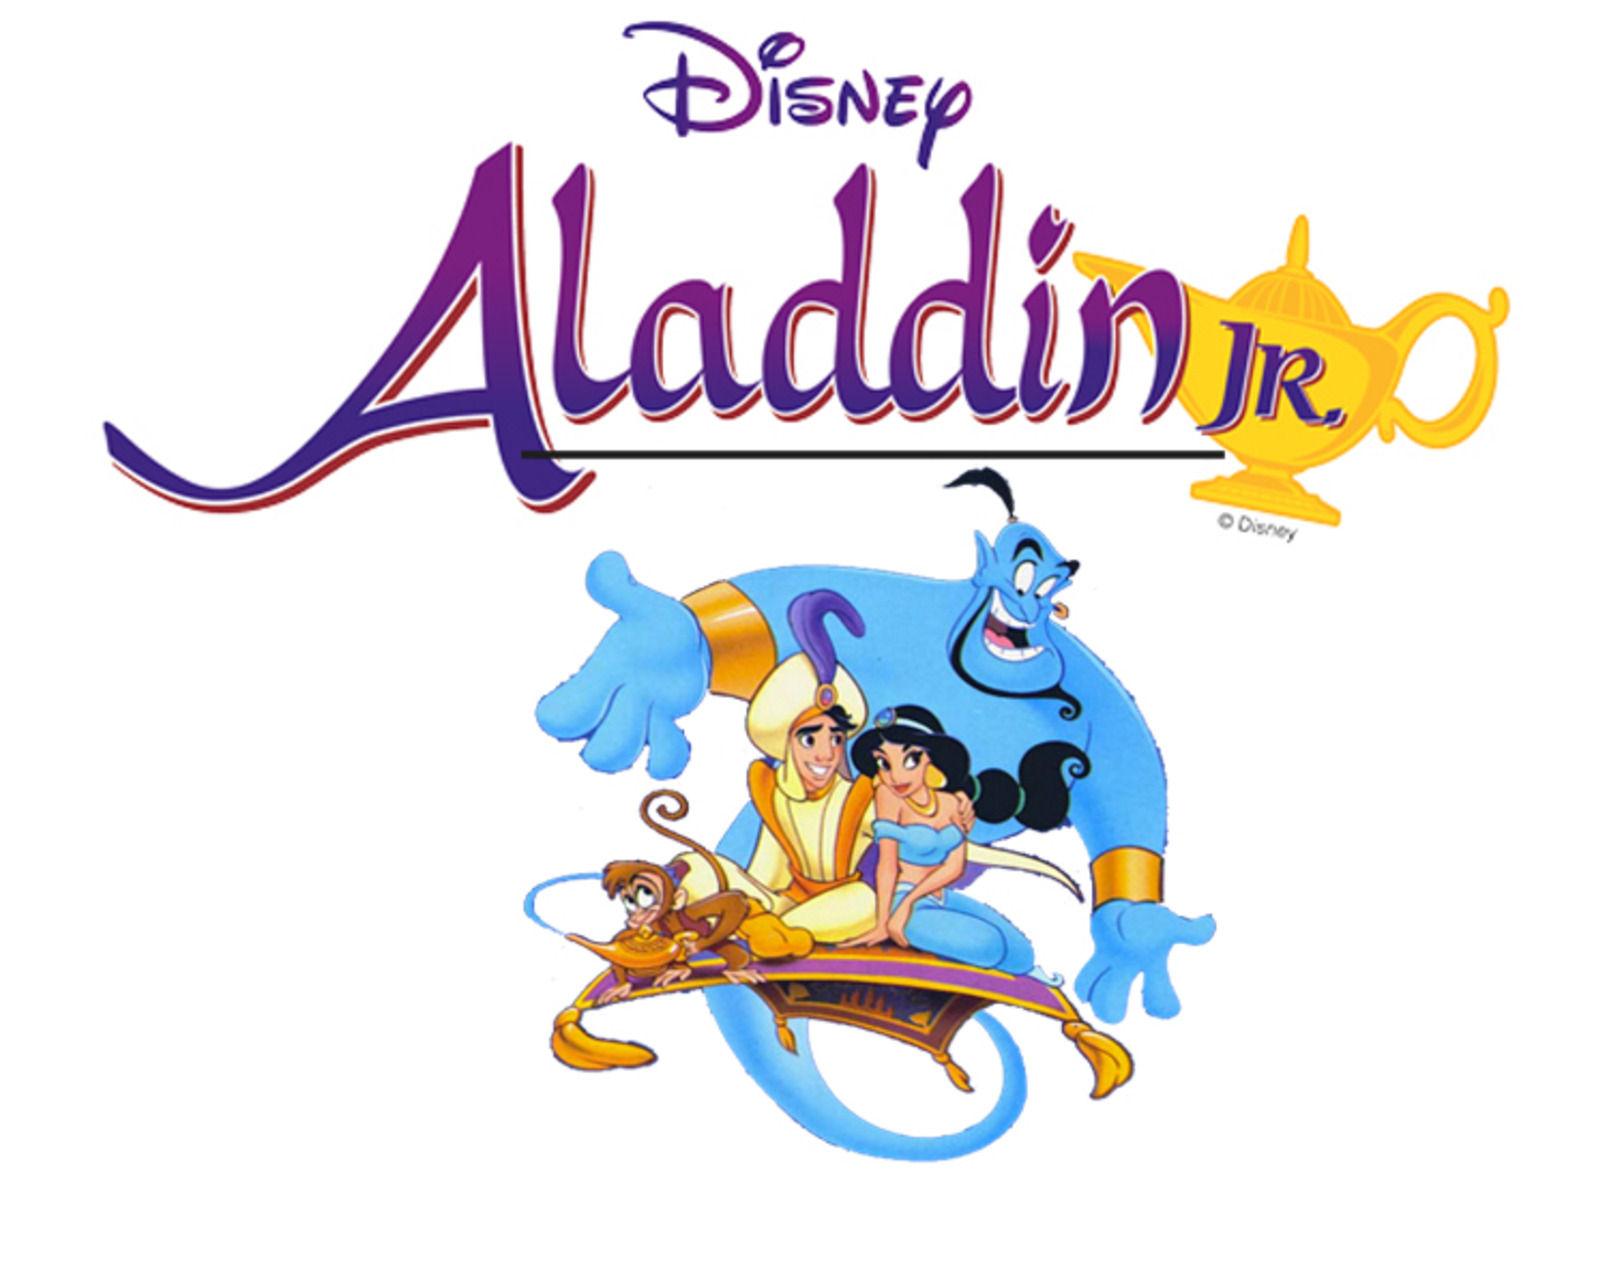 auditions for disney s aladdin jr set for aug 9 10 features rh herald dispatch com  disney aladdin jr logo